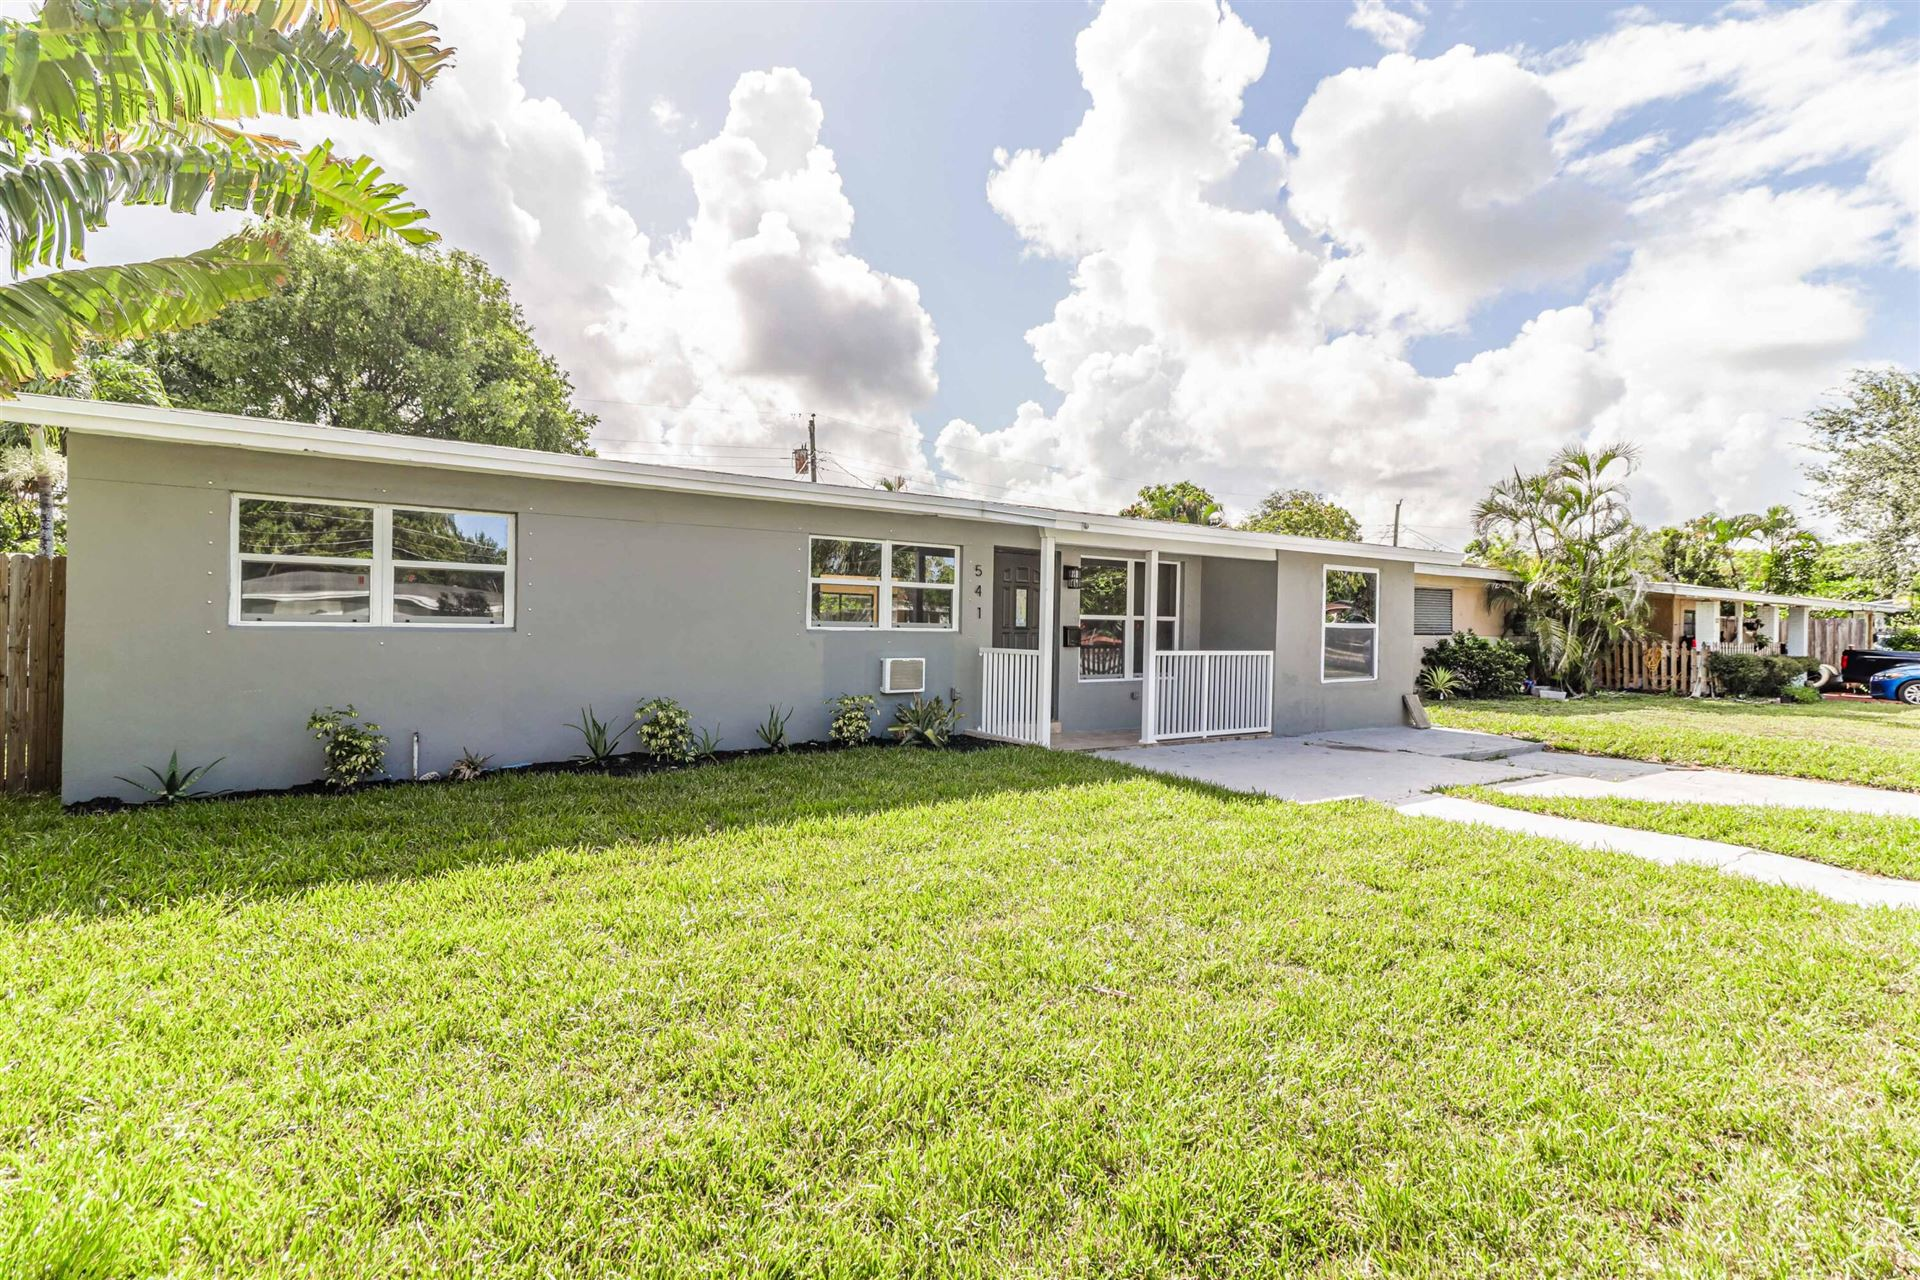 Photo of 541 SW 22nd Terrace, Fort Lauderdale, FL 33312 (MLS # RX-10731454)